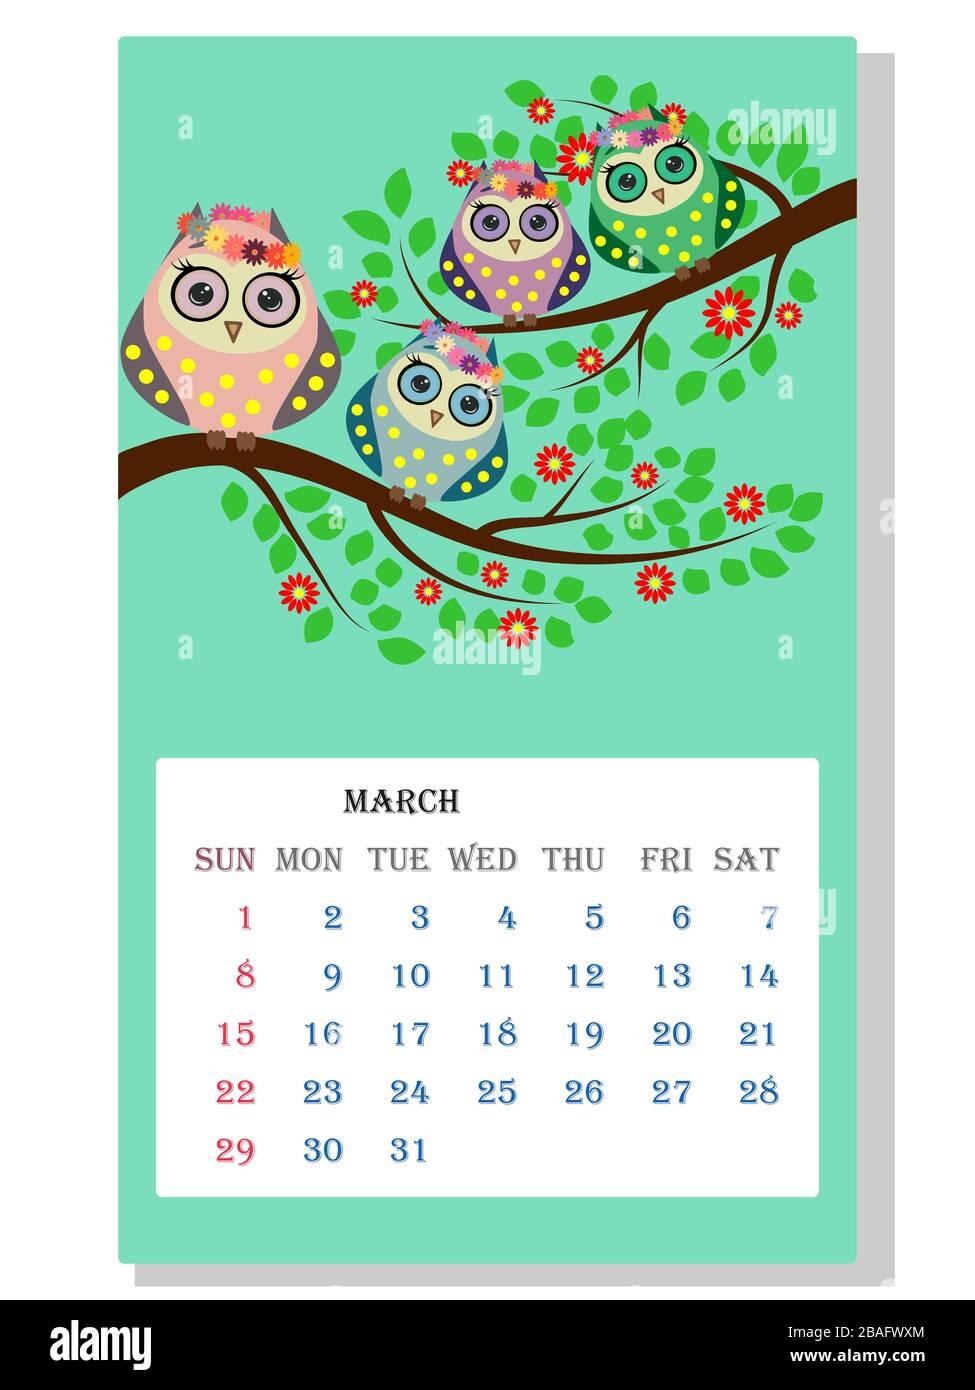 Calendario 2021. Gufi e uccelli carini per ogni mese Immagine e